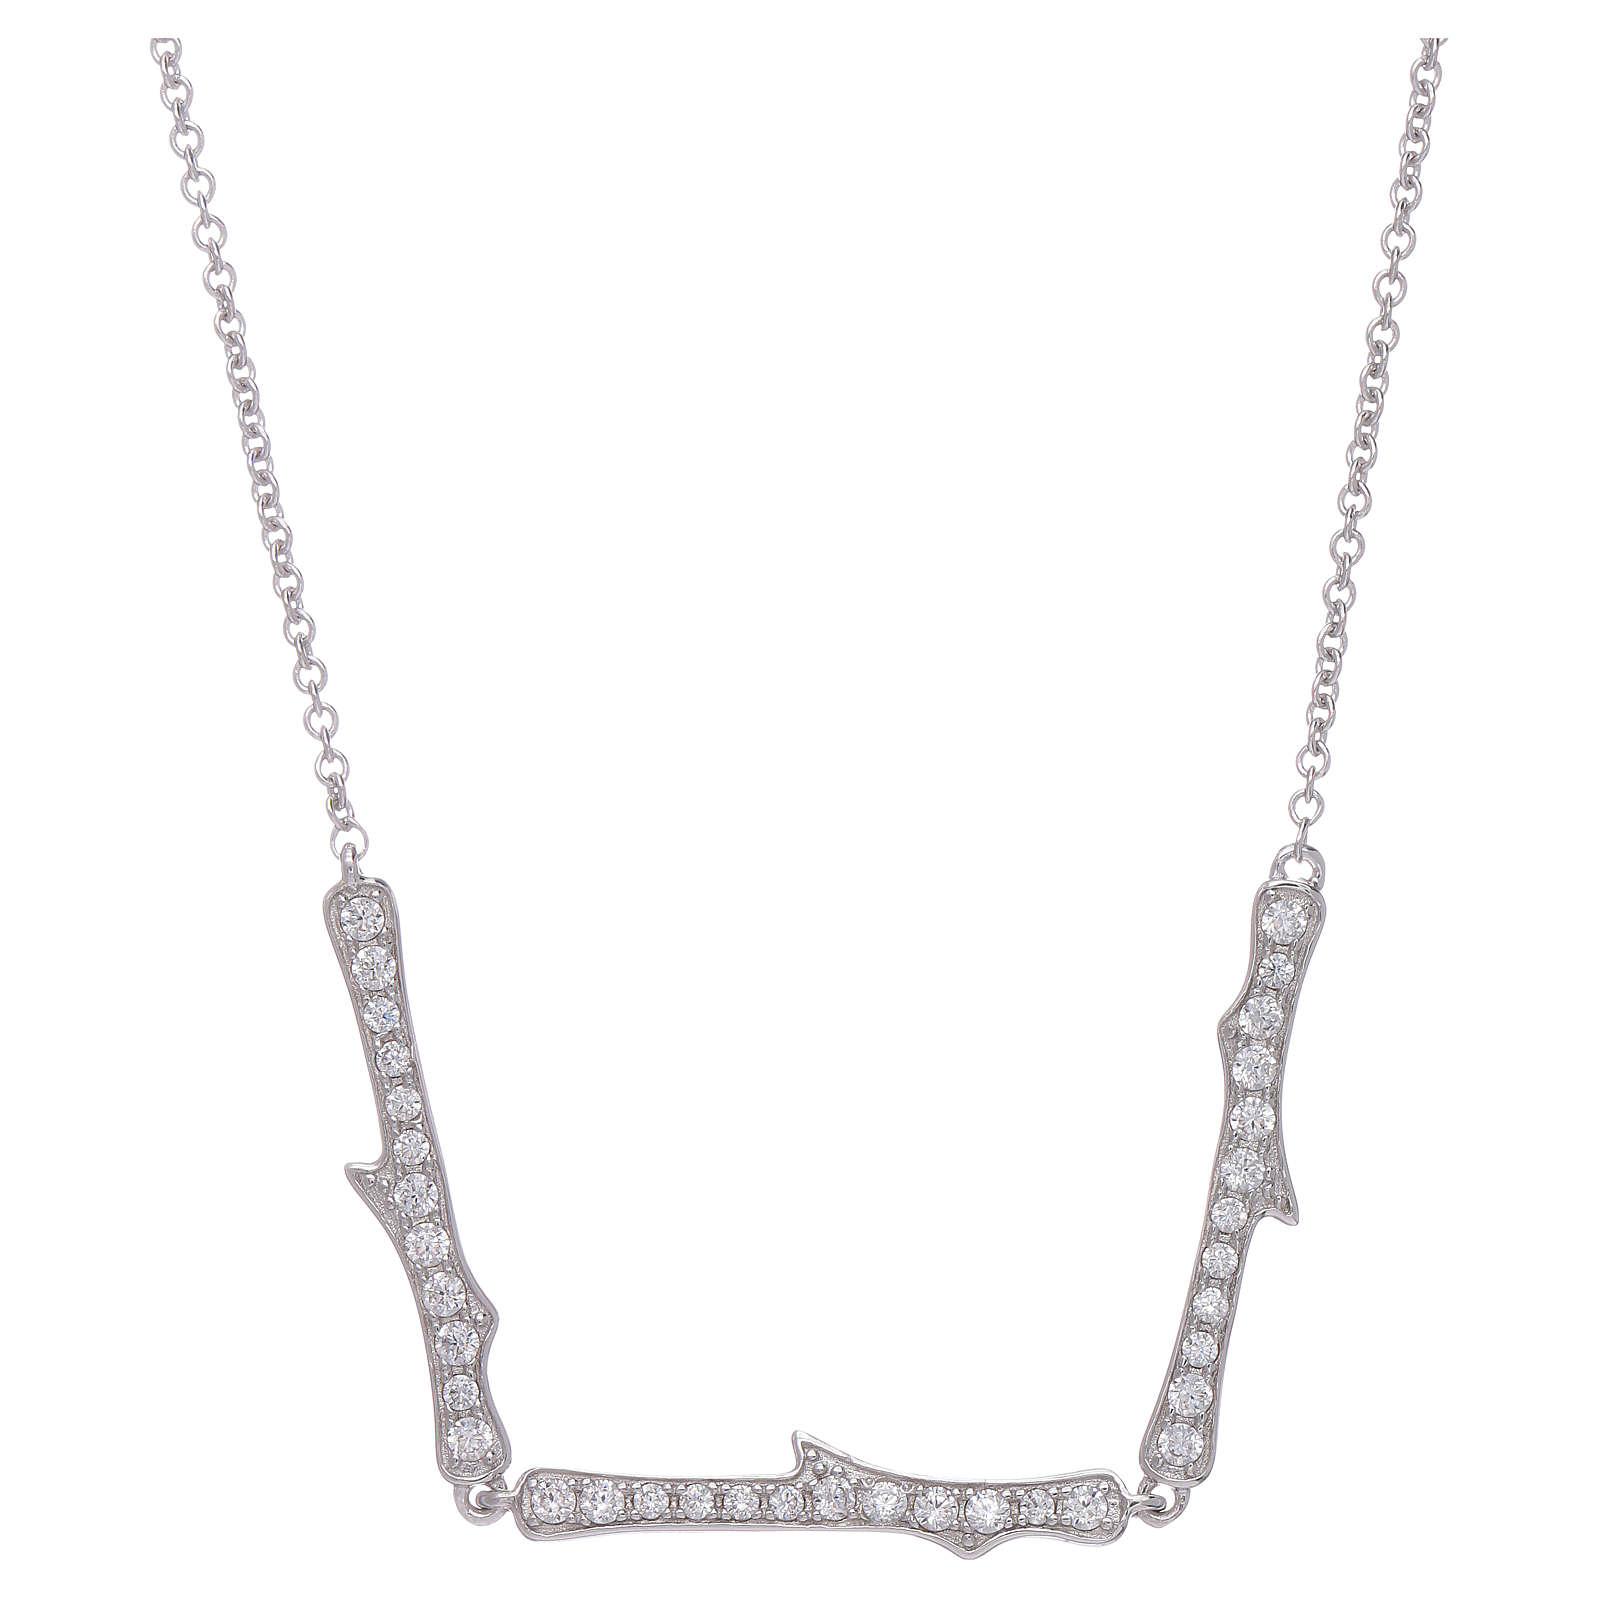 Collana AMEN argento 925 rodio zirconi bianchi 4